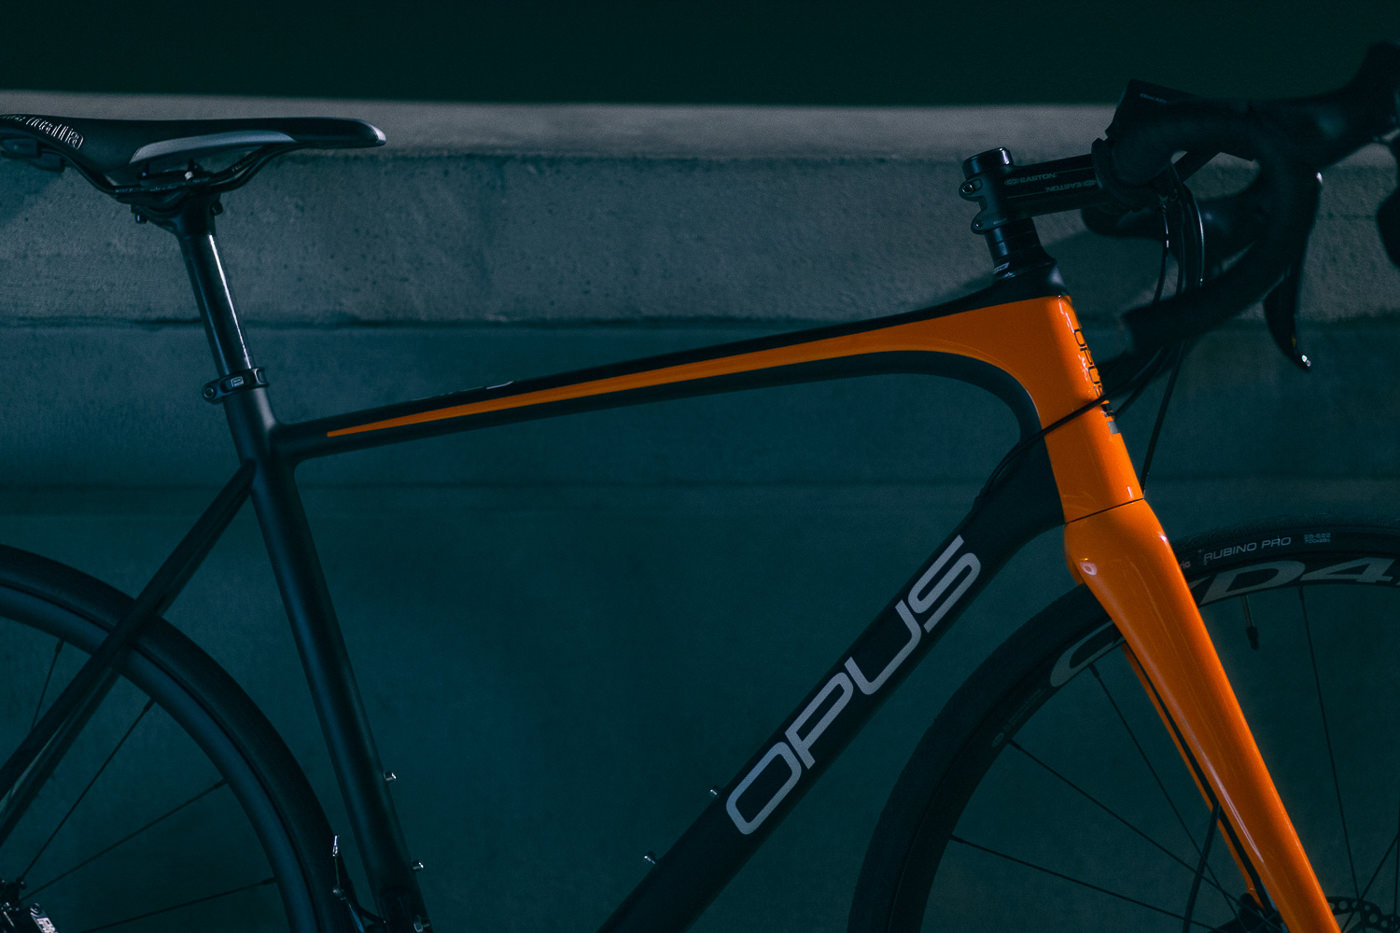 Vélo de route Opus bike orange en soirée